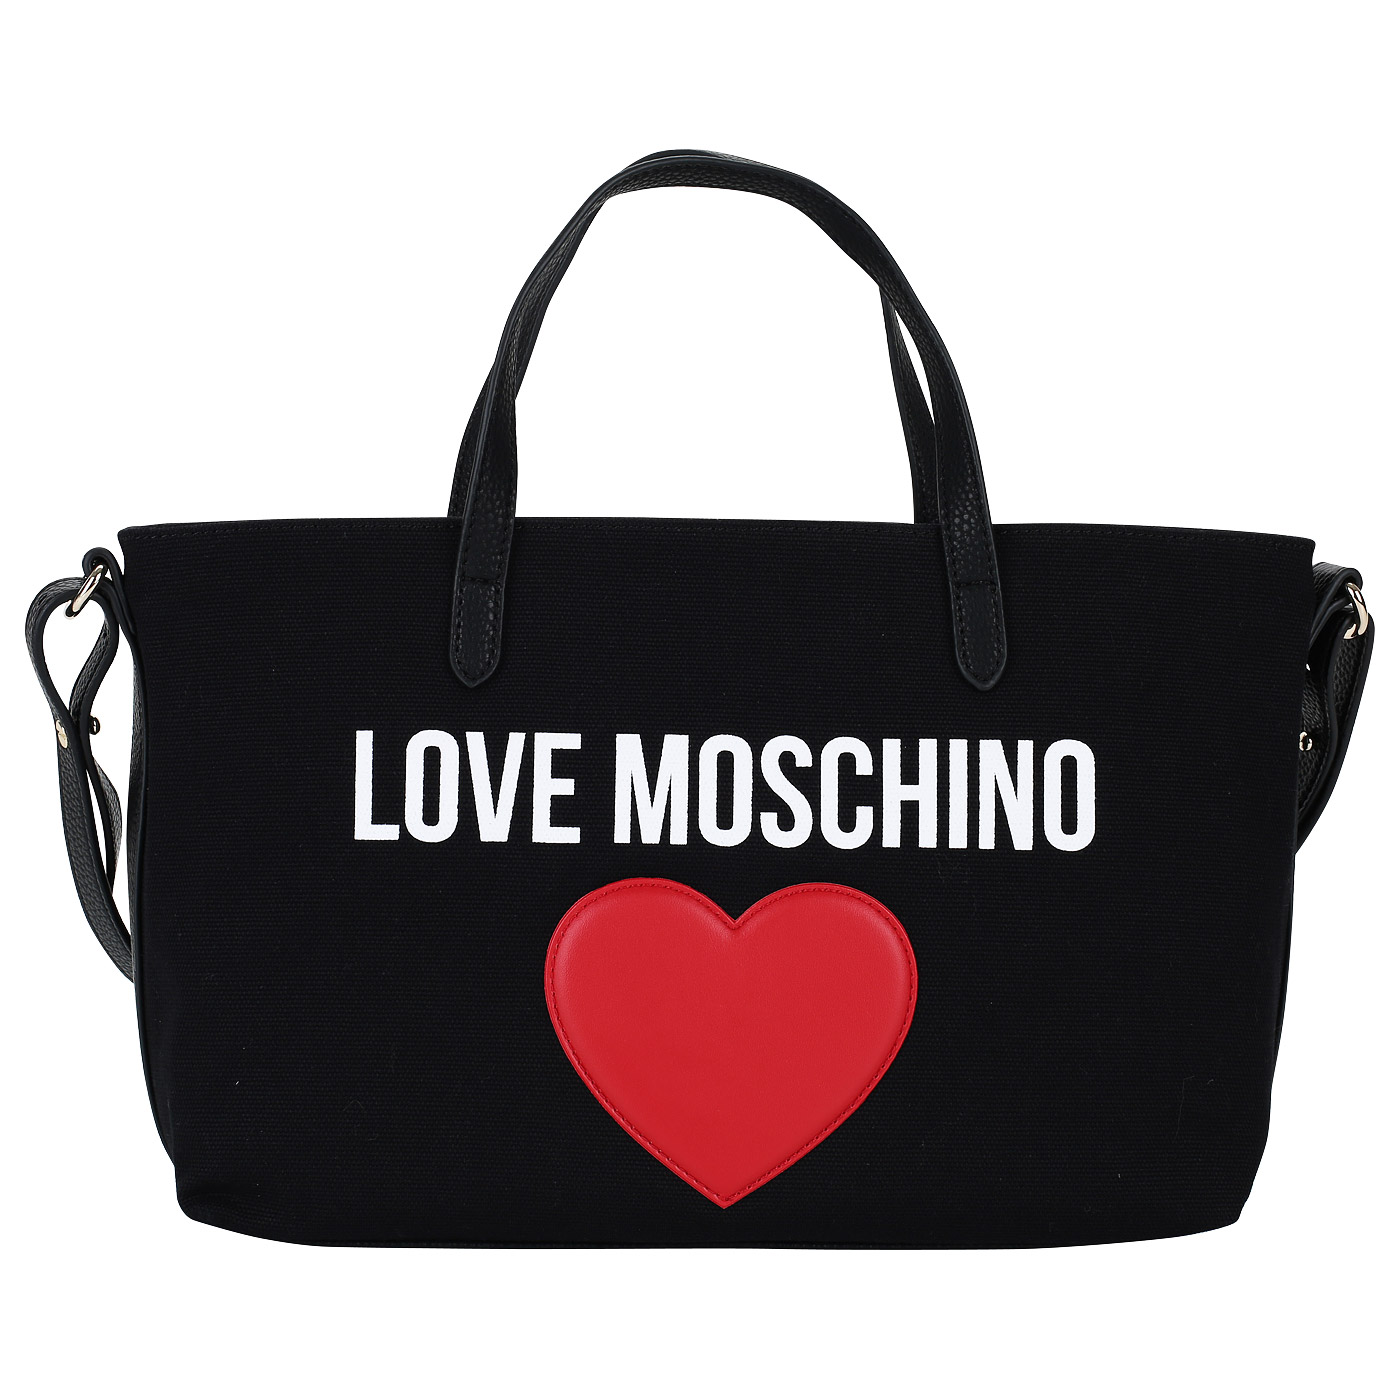 0eaeae5ea362 Черная женская сумка Love Moschino LM and Heart JC4137PP15_00A ...